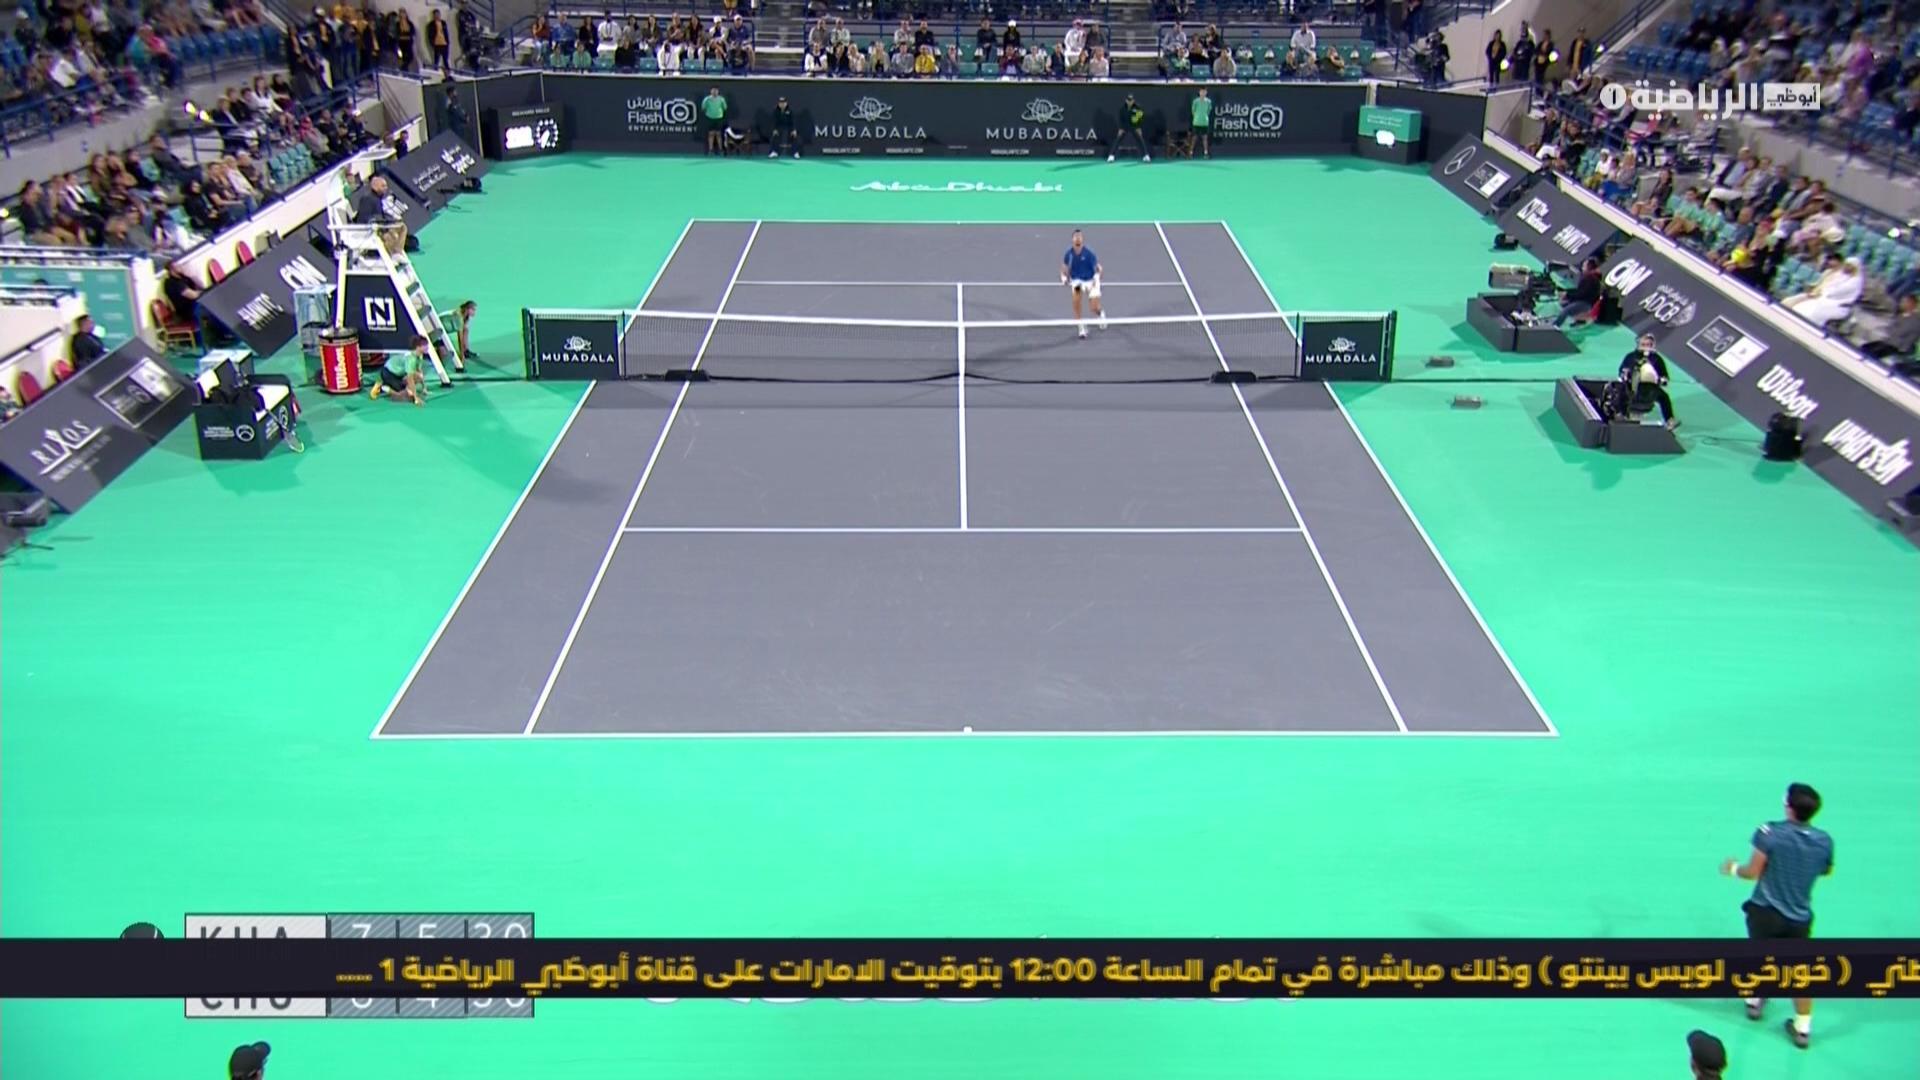 AD Sports - قناة أبو ظبي الرياضية 1 Catch Up